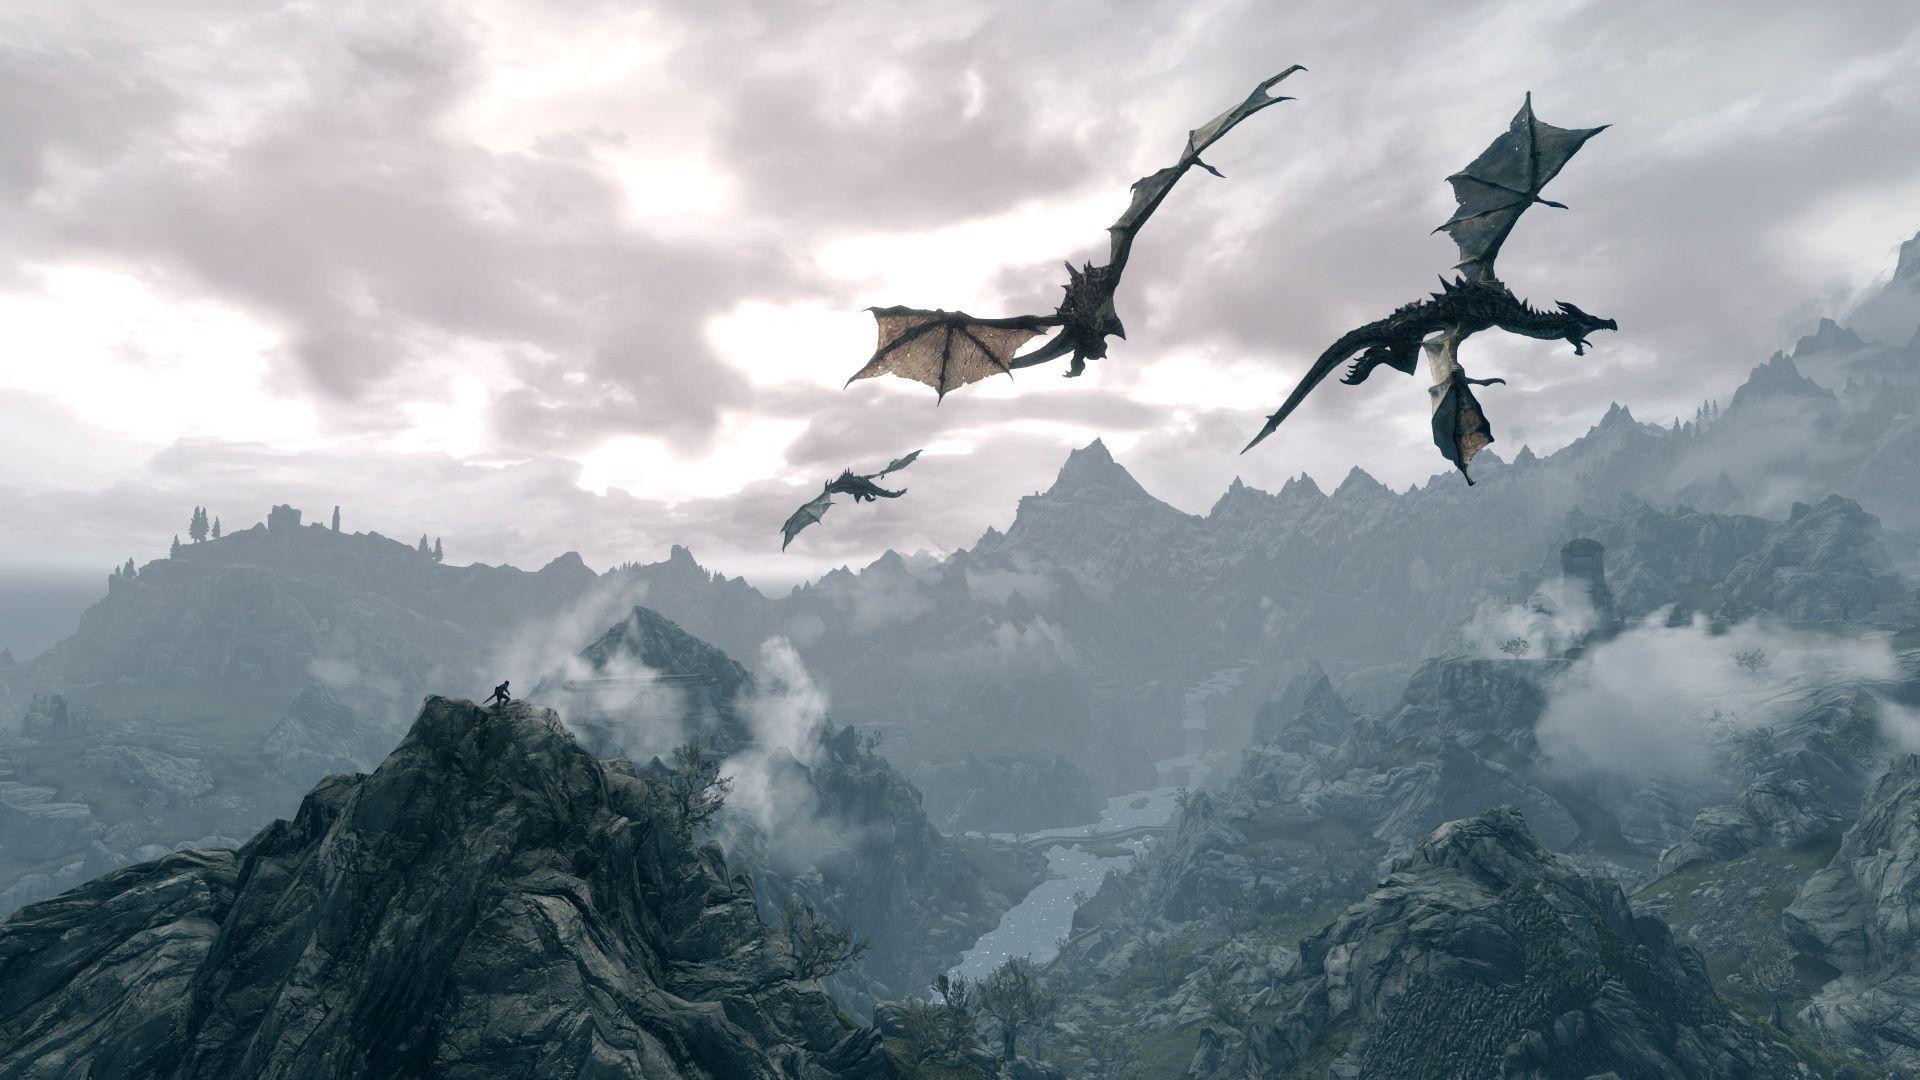 Skyrim Desktop Dragon Wallpaper  Images